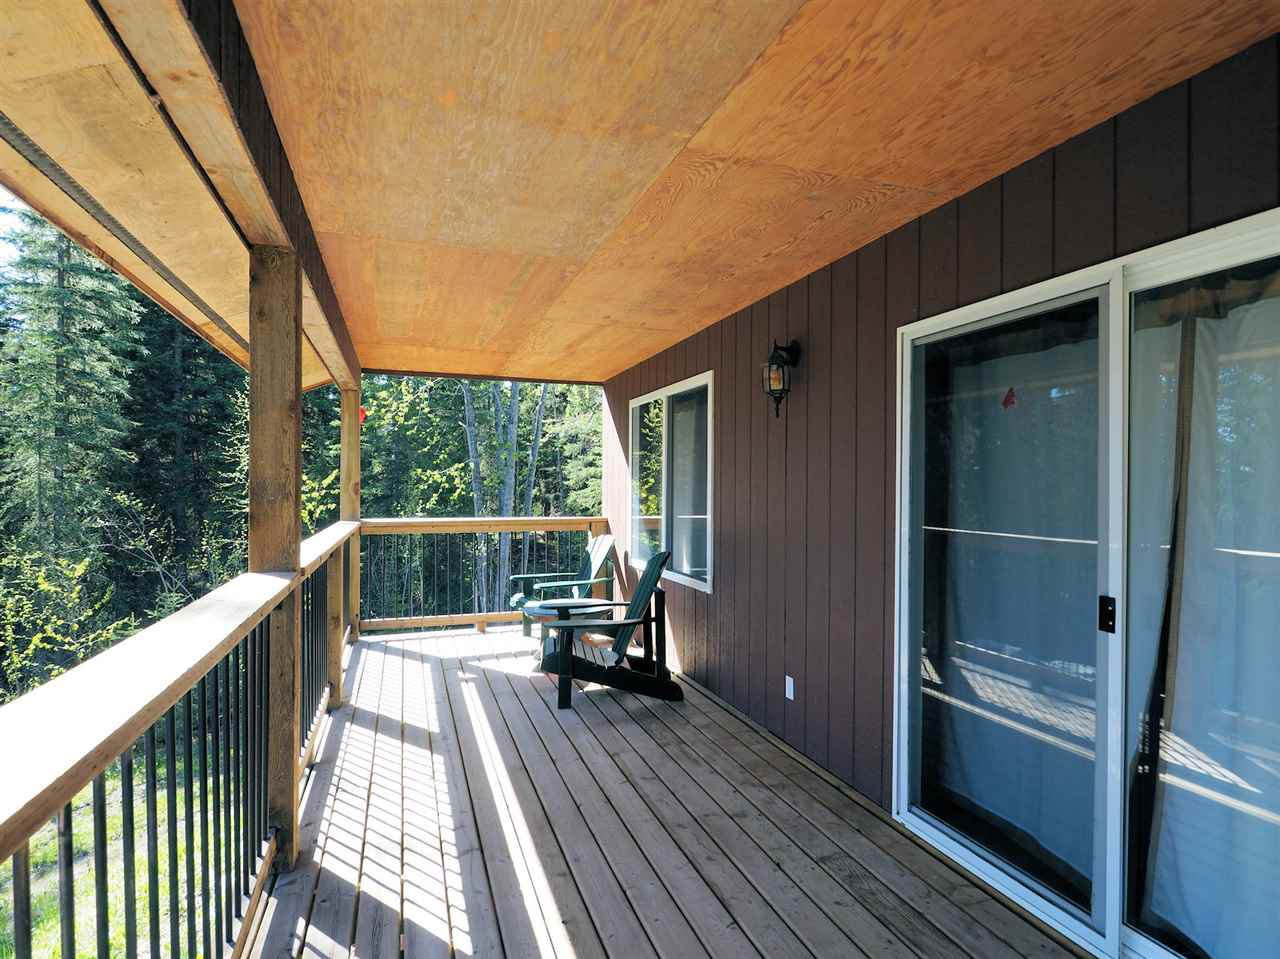 Photo 6: Photos: 8222 CENTENNIAL Road in Bridge Lake: Bridge Lake/Sheridan Lake House for sale (100 Mile House (Zone 10))  : MLS®# R2457362